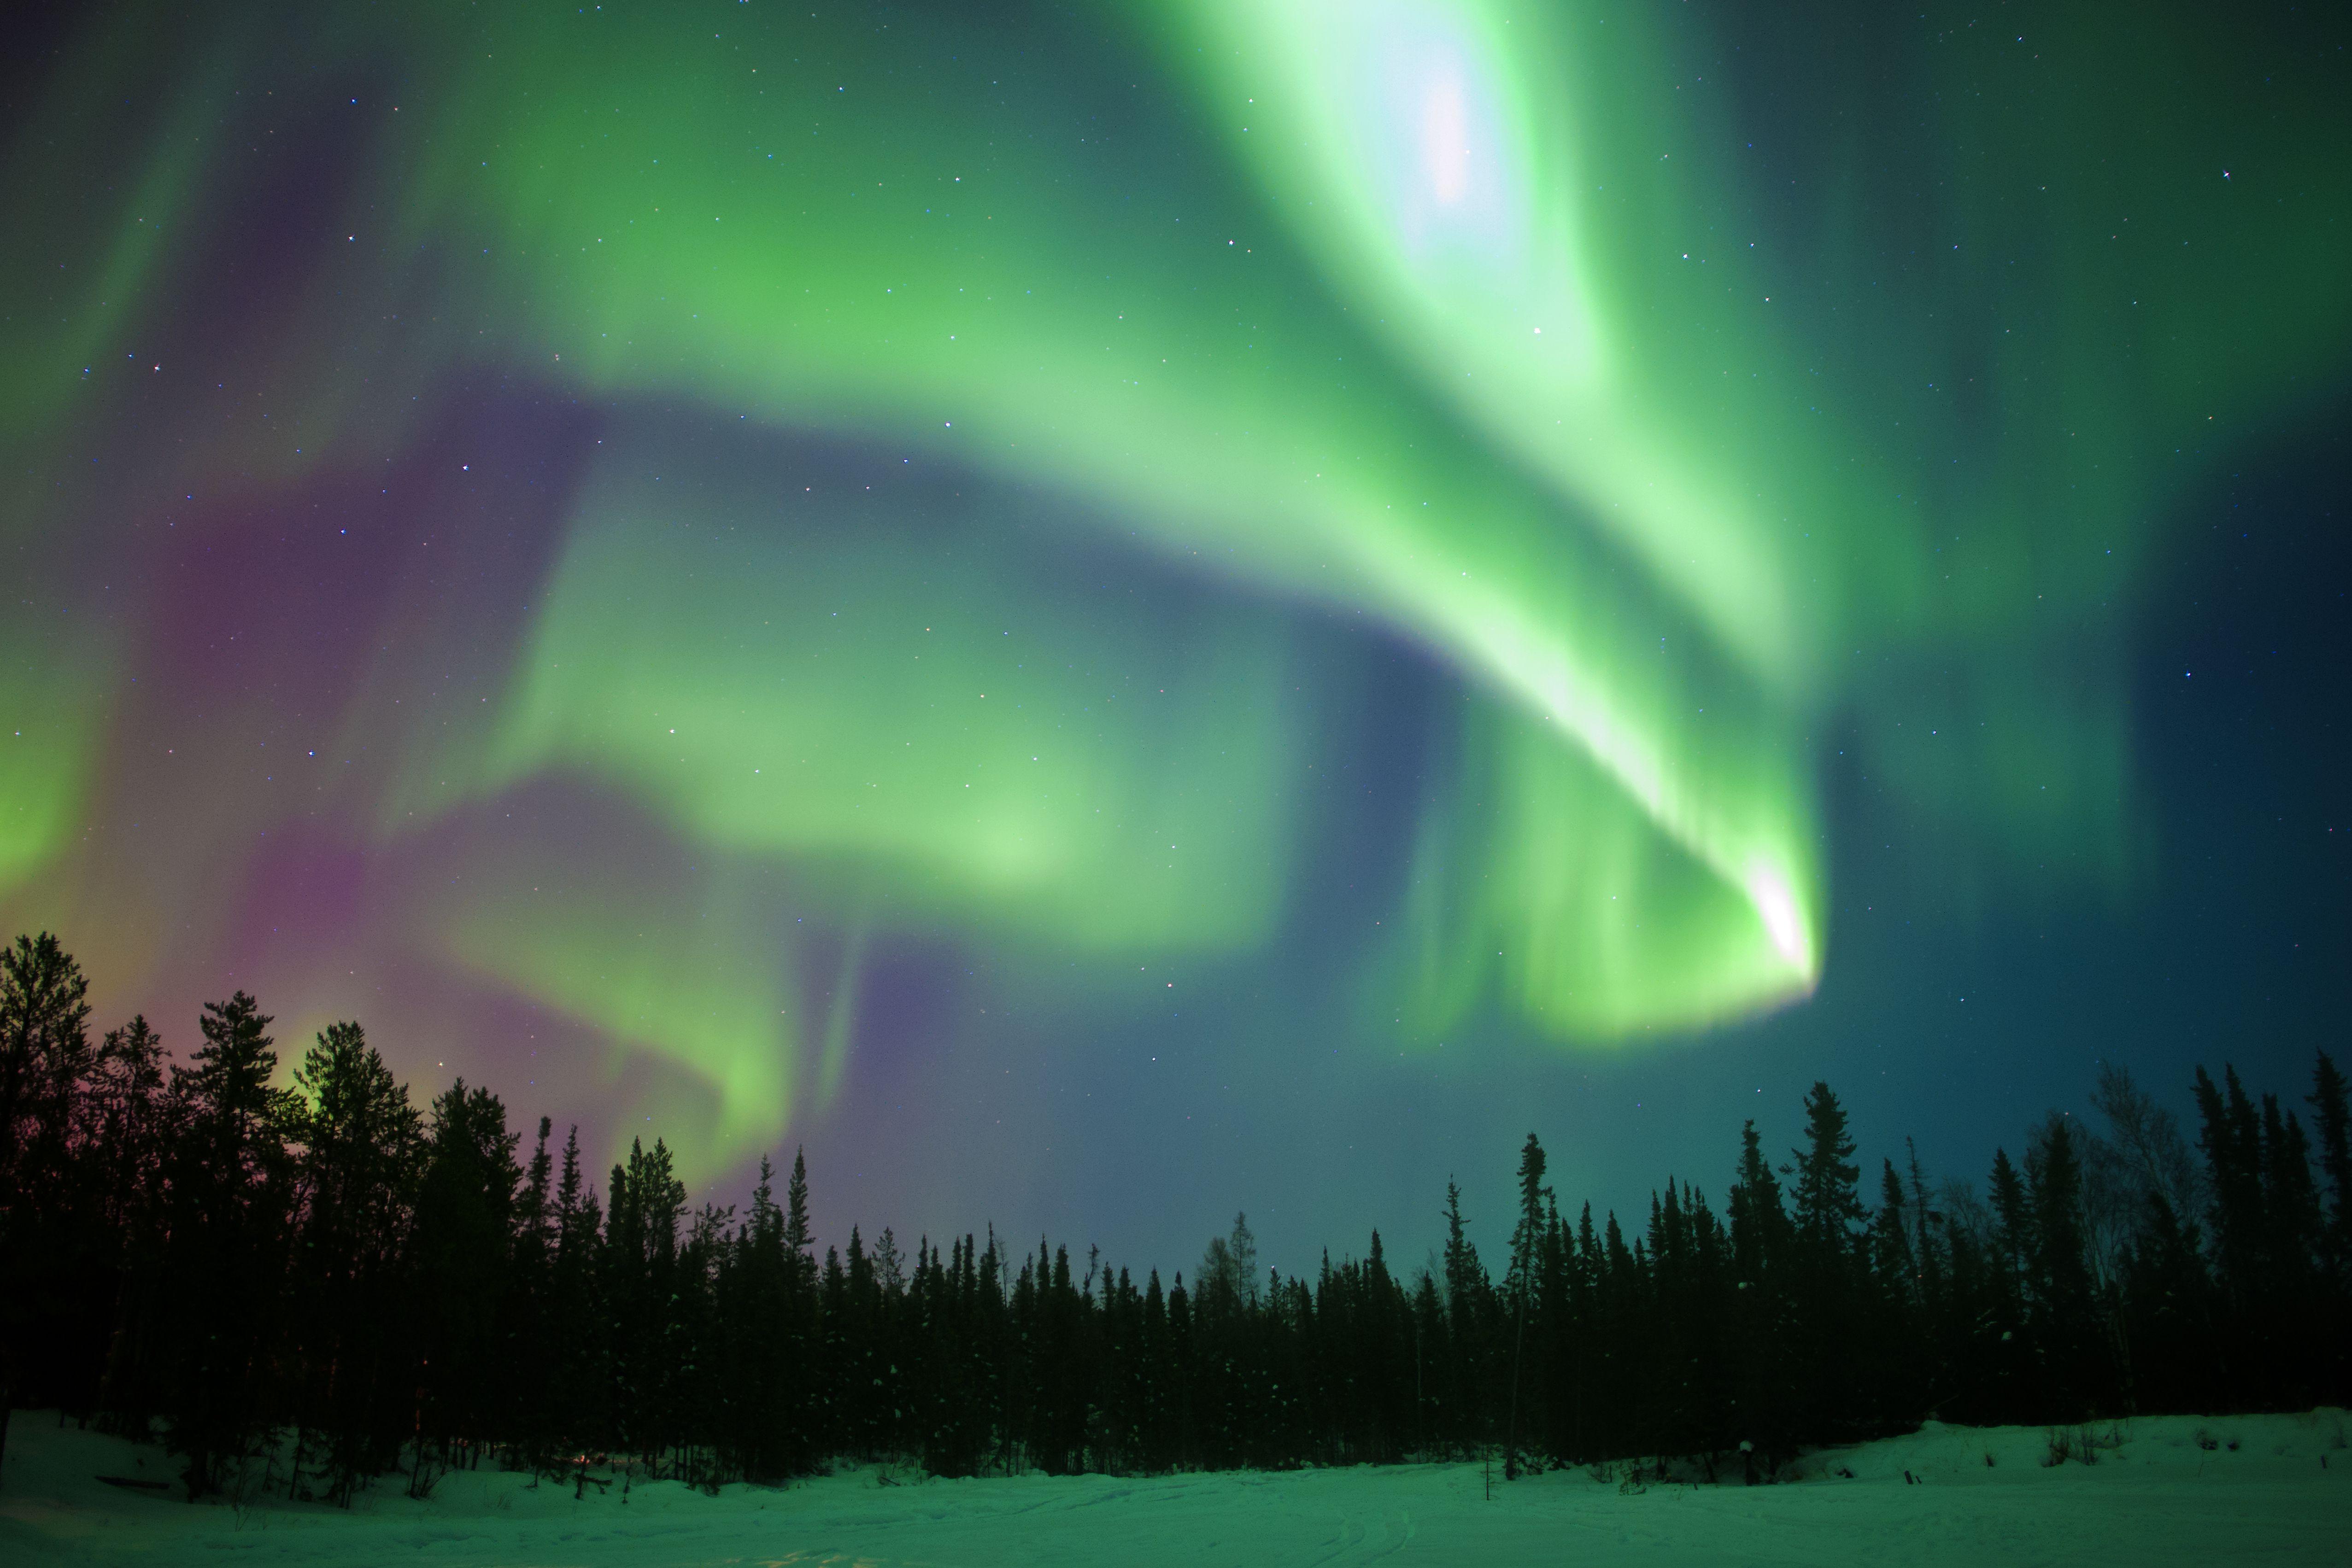 Aurora borealis, Nordlichter, borealen Wald, Yellow Umgebung, NWT, Kanada Aurora borealis, Nordlichter, borealen Wald, Umgebung Yellow, NWT, Kanada